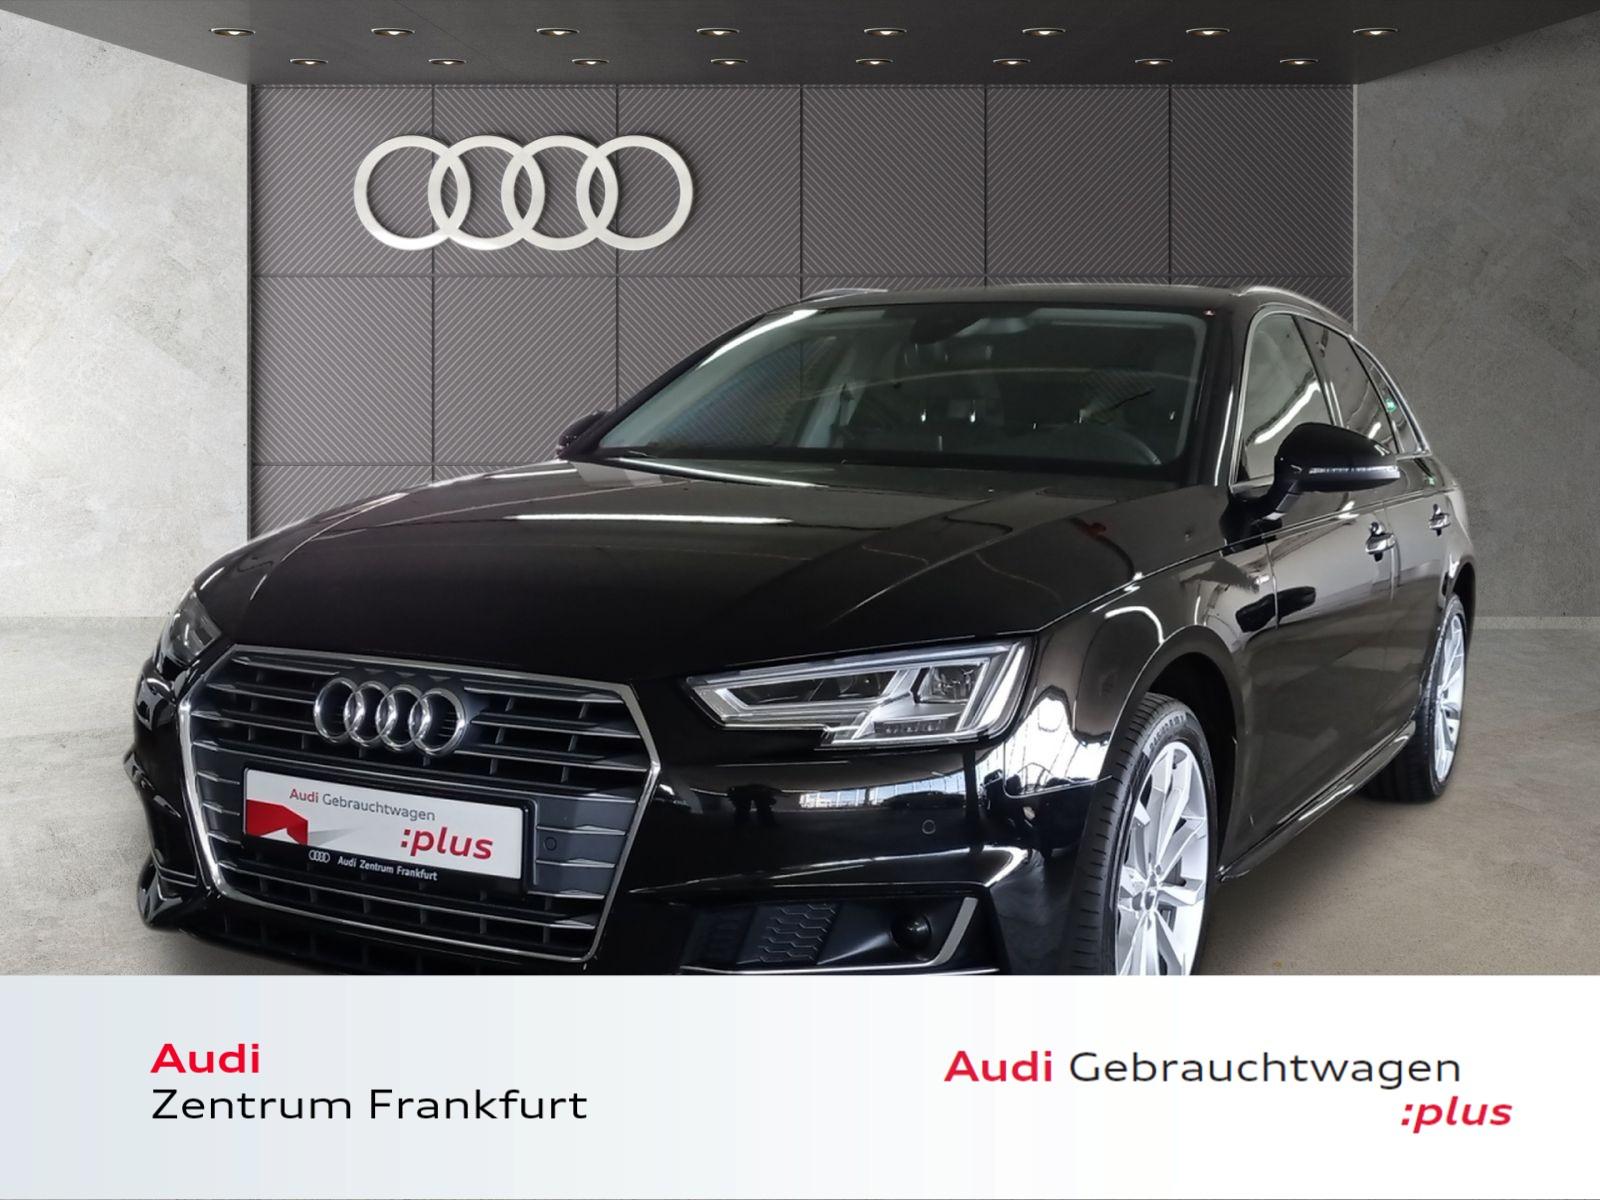 Audi A4 Avant 2.0 TDI S tronic S line LED Navi Tempomat, Jahr 2017, Diesel